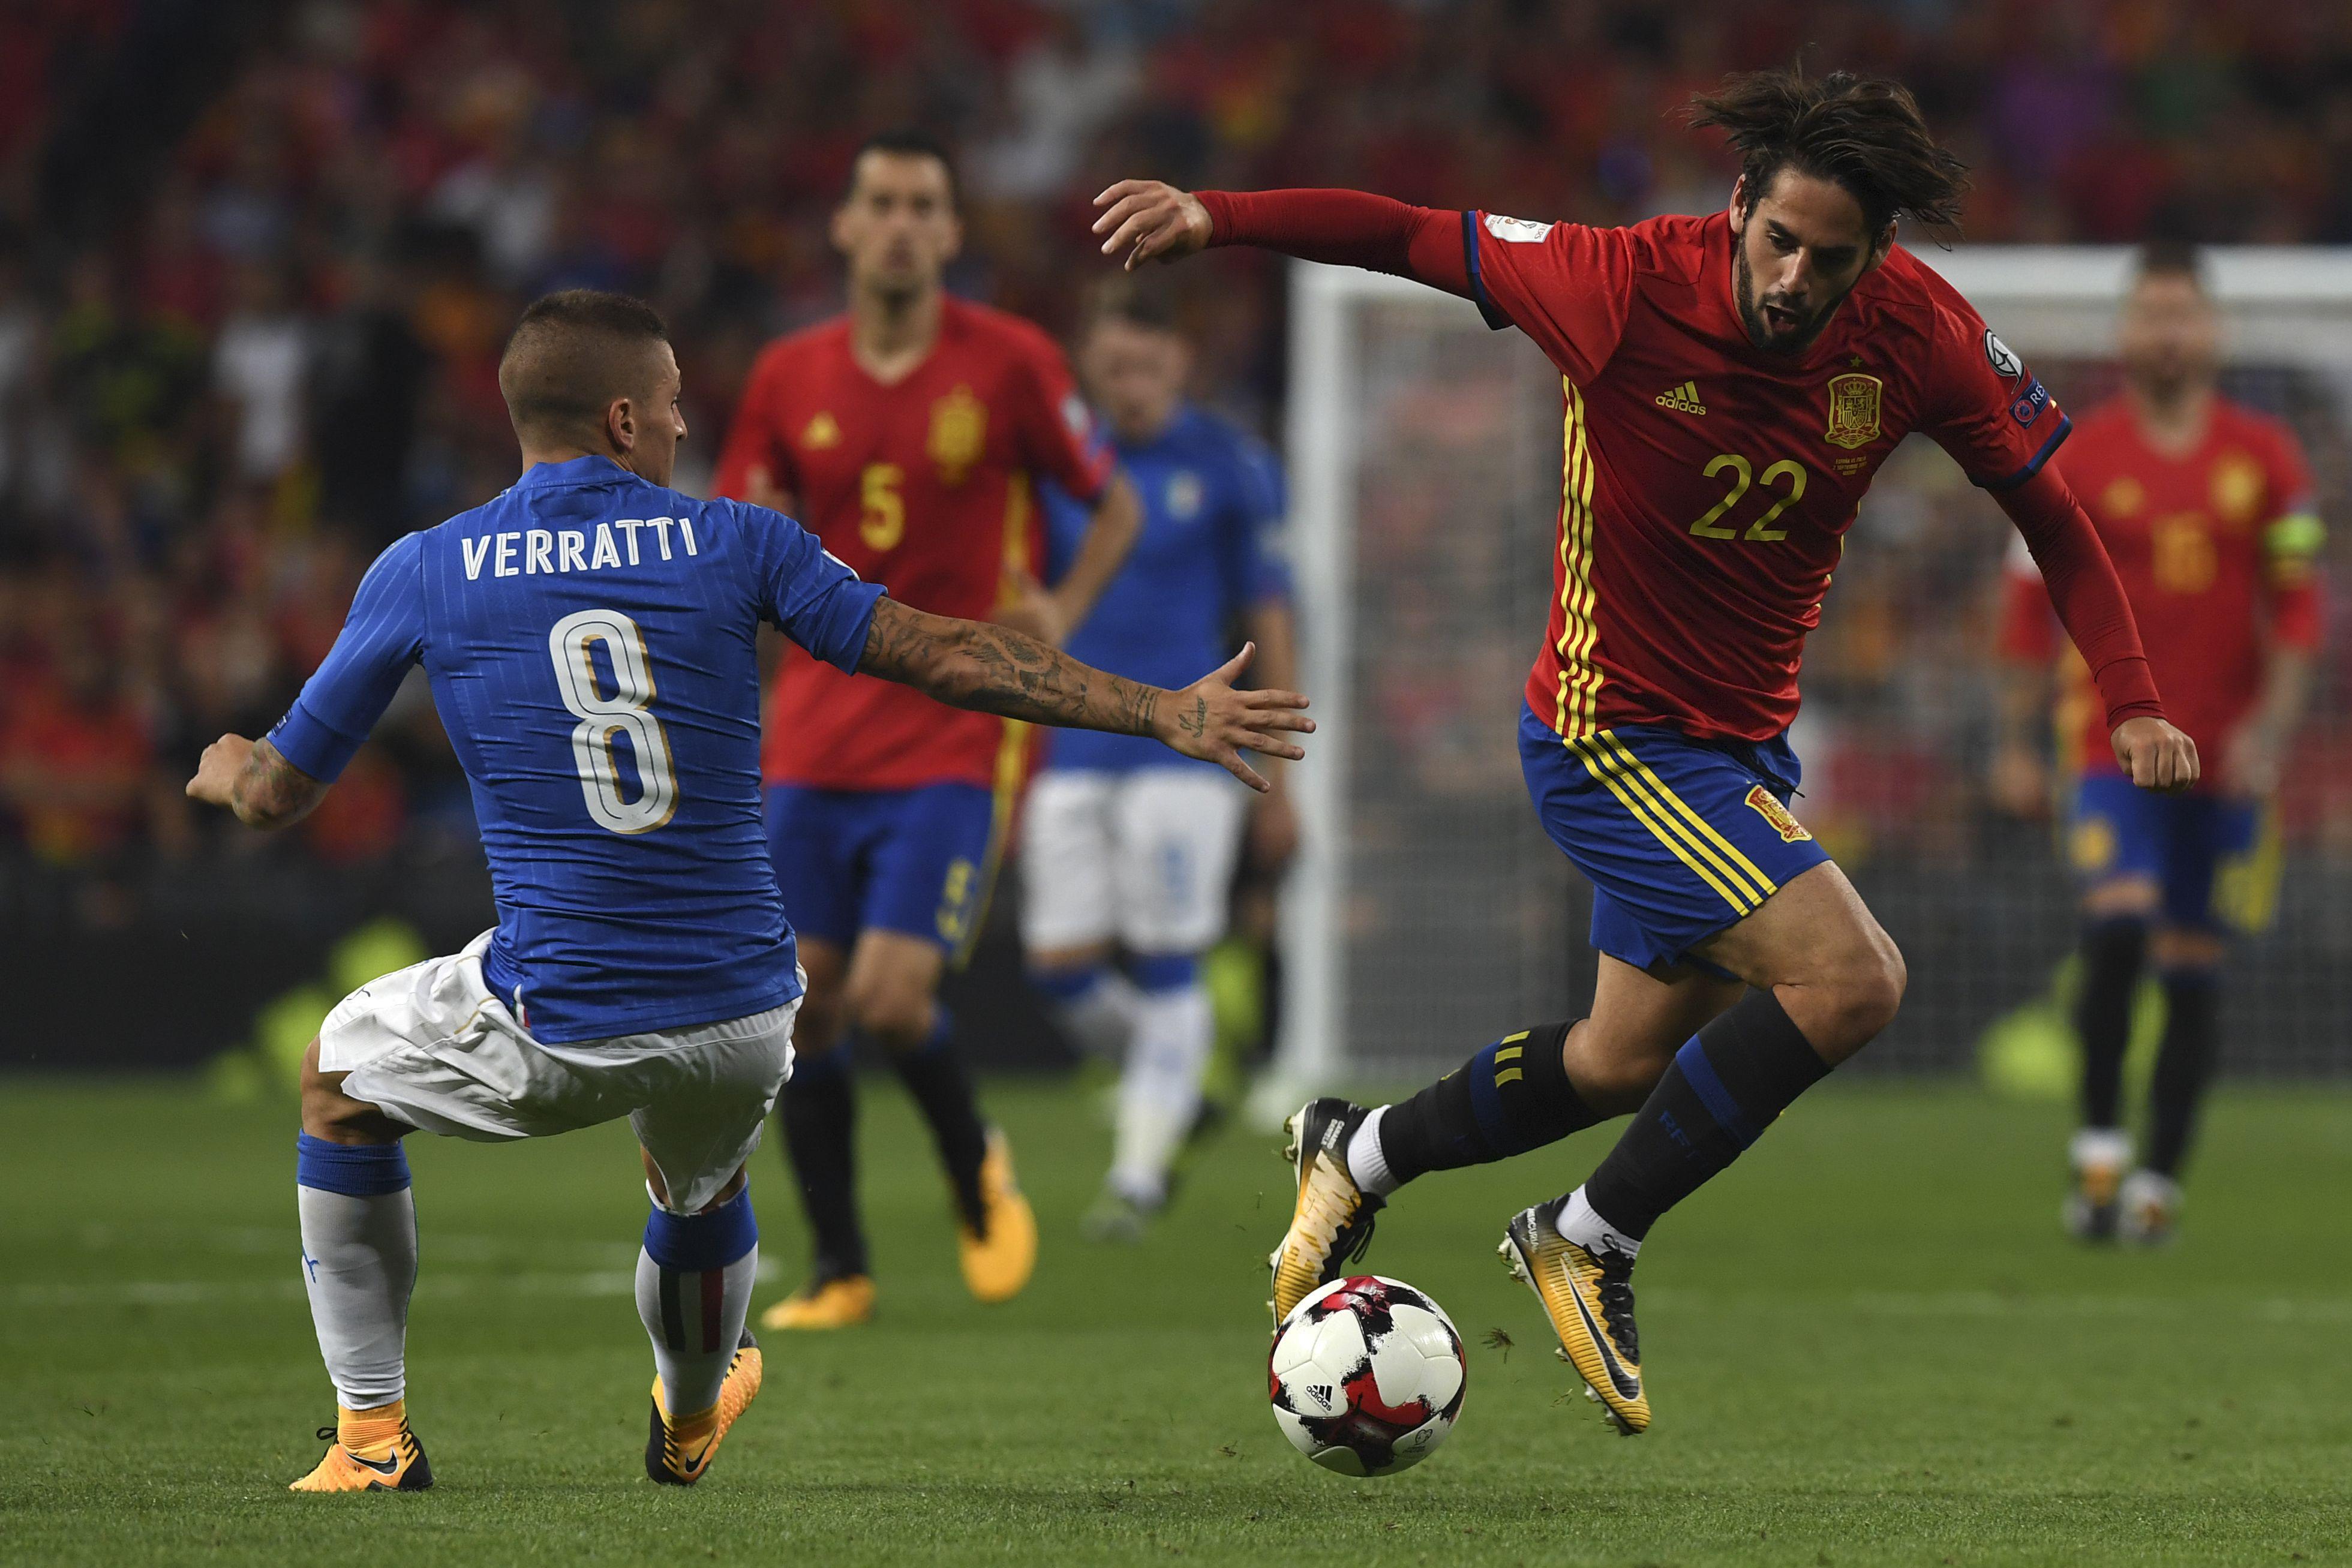 Verratti couldn't get close to Isco all night